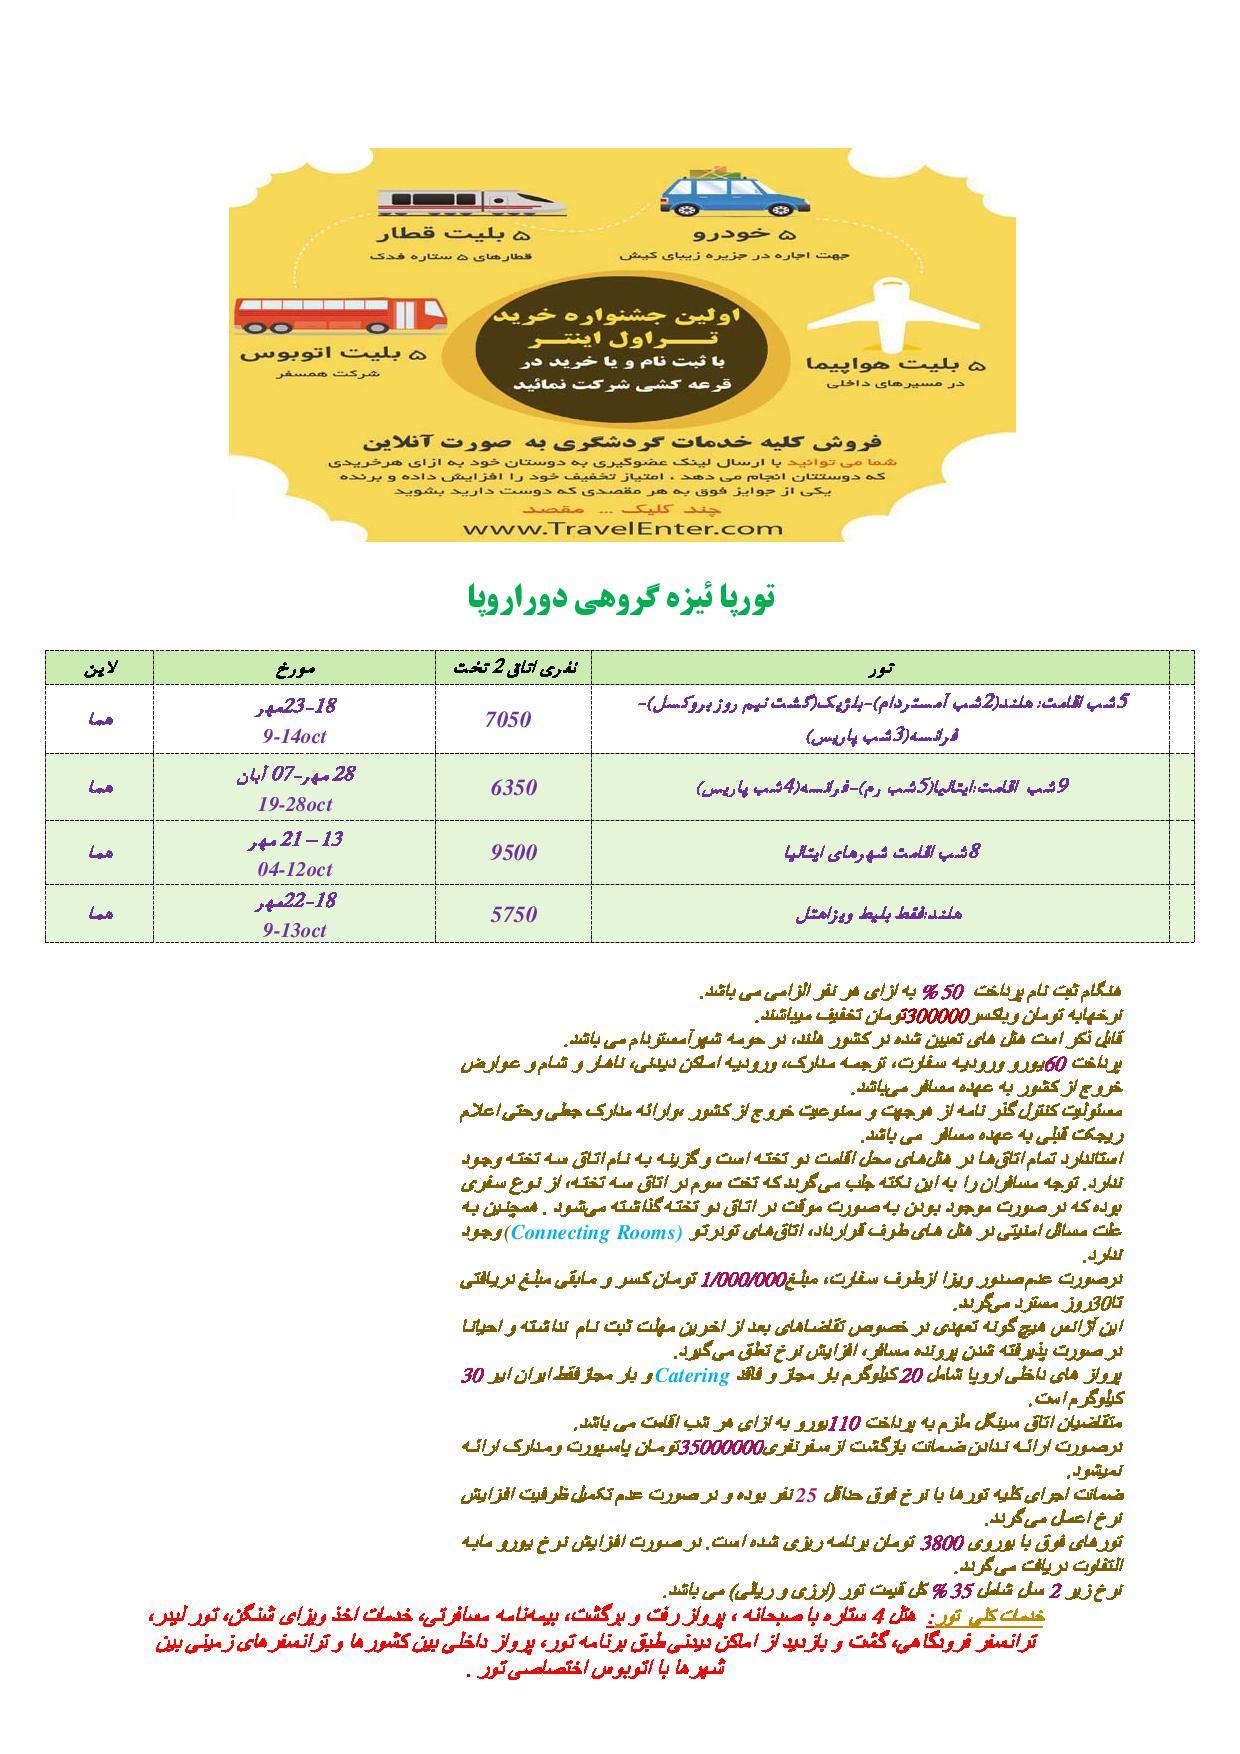 asp page